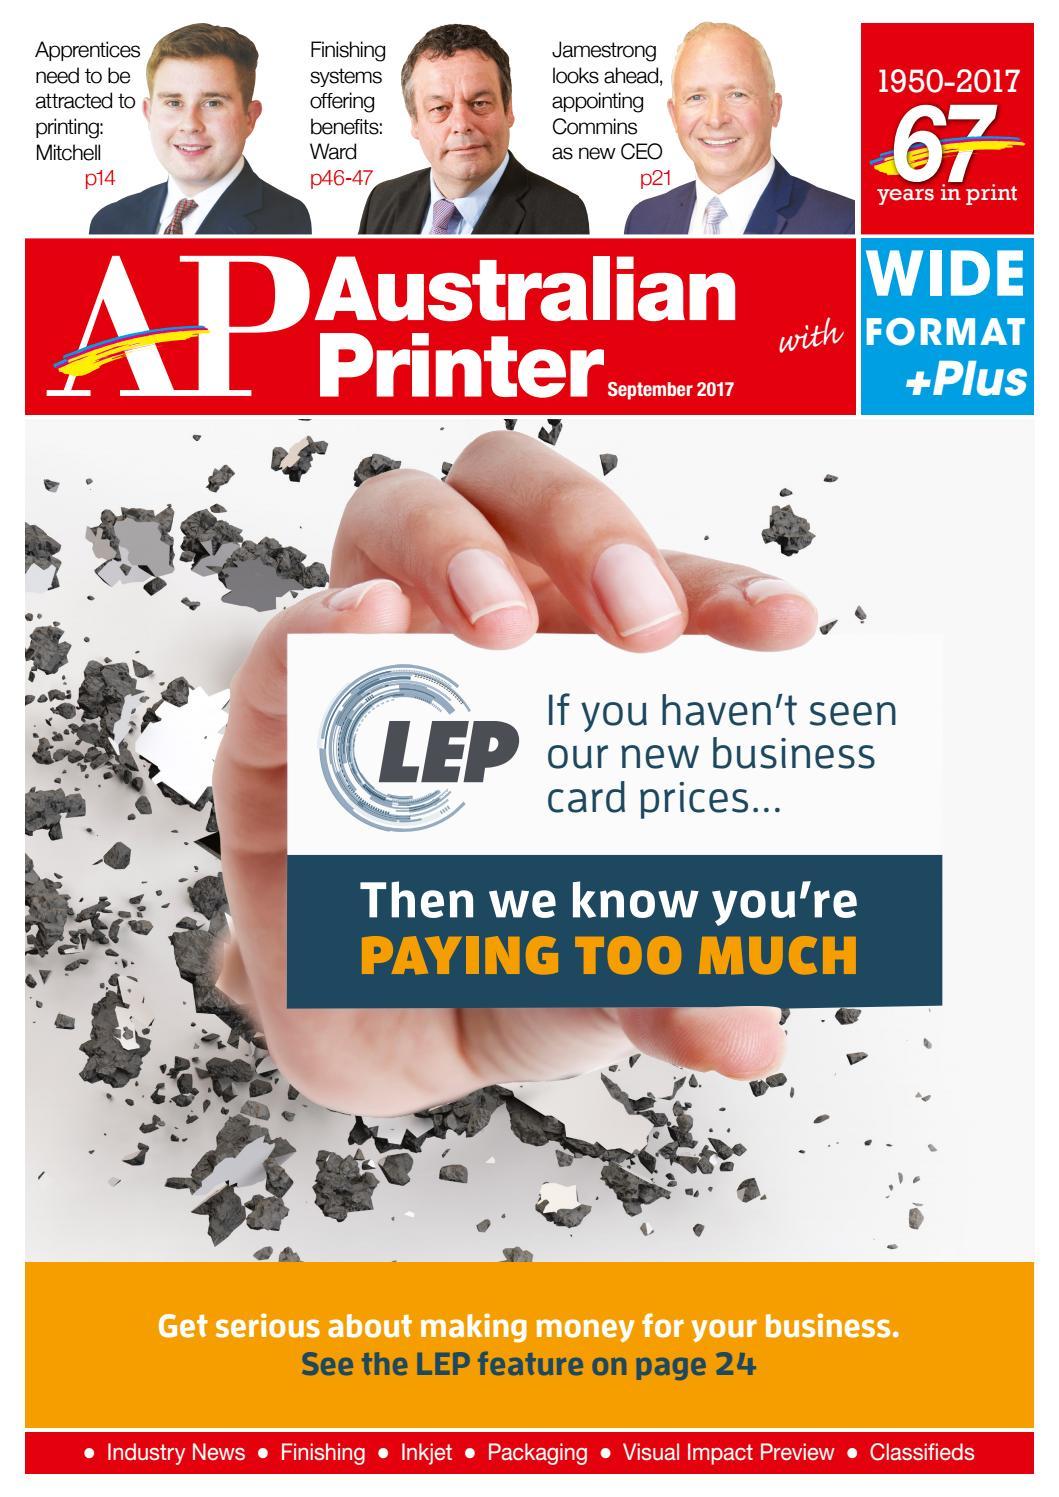 Australian Printer September 2017 by The Intermedia Group